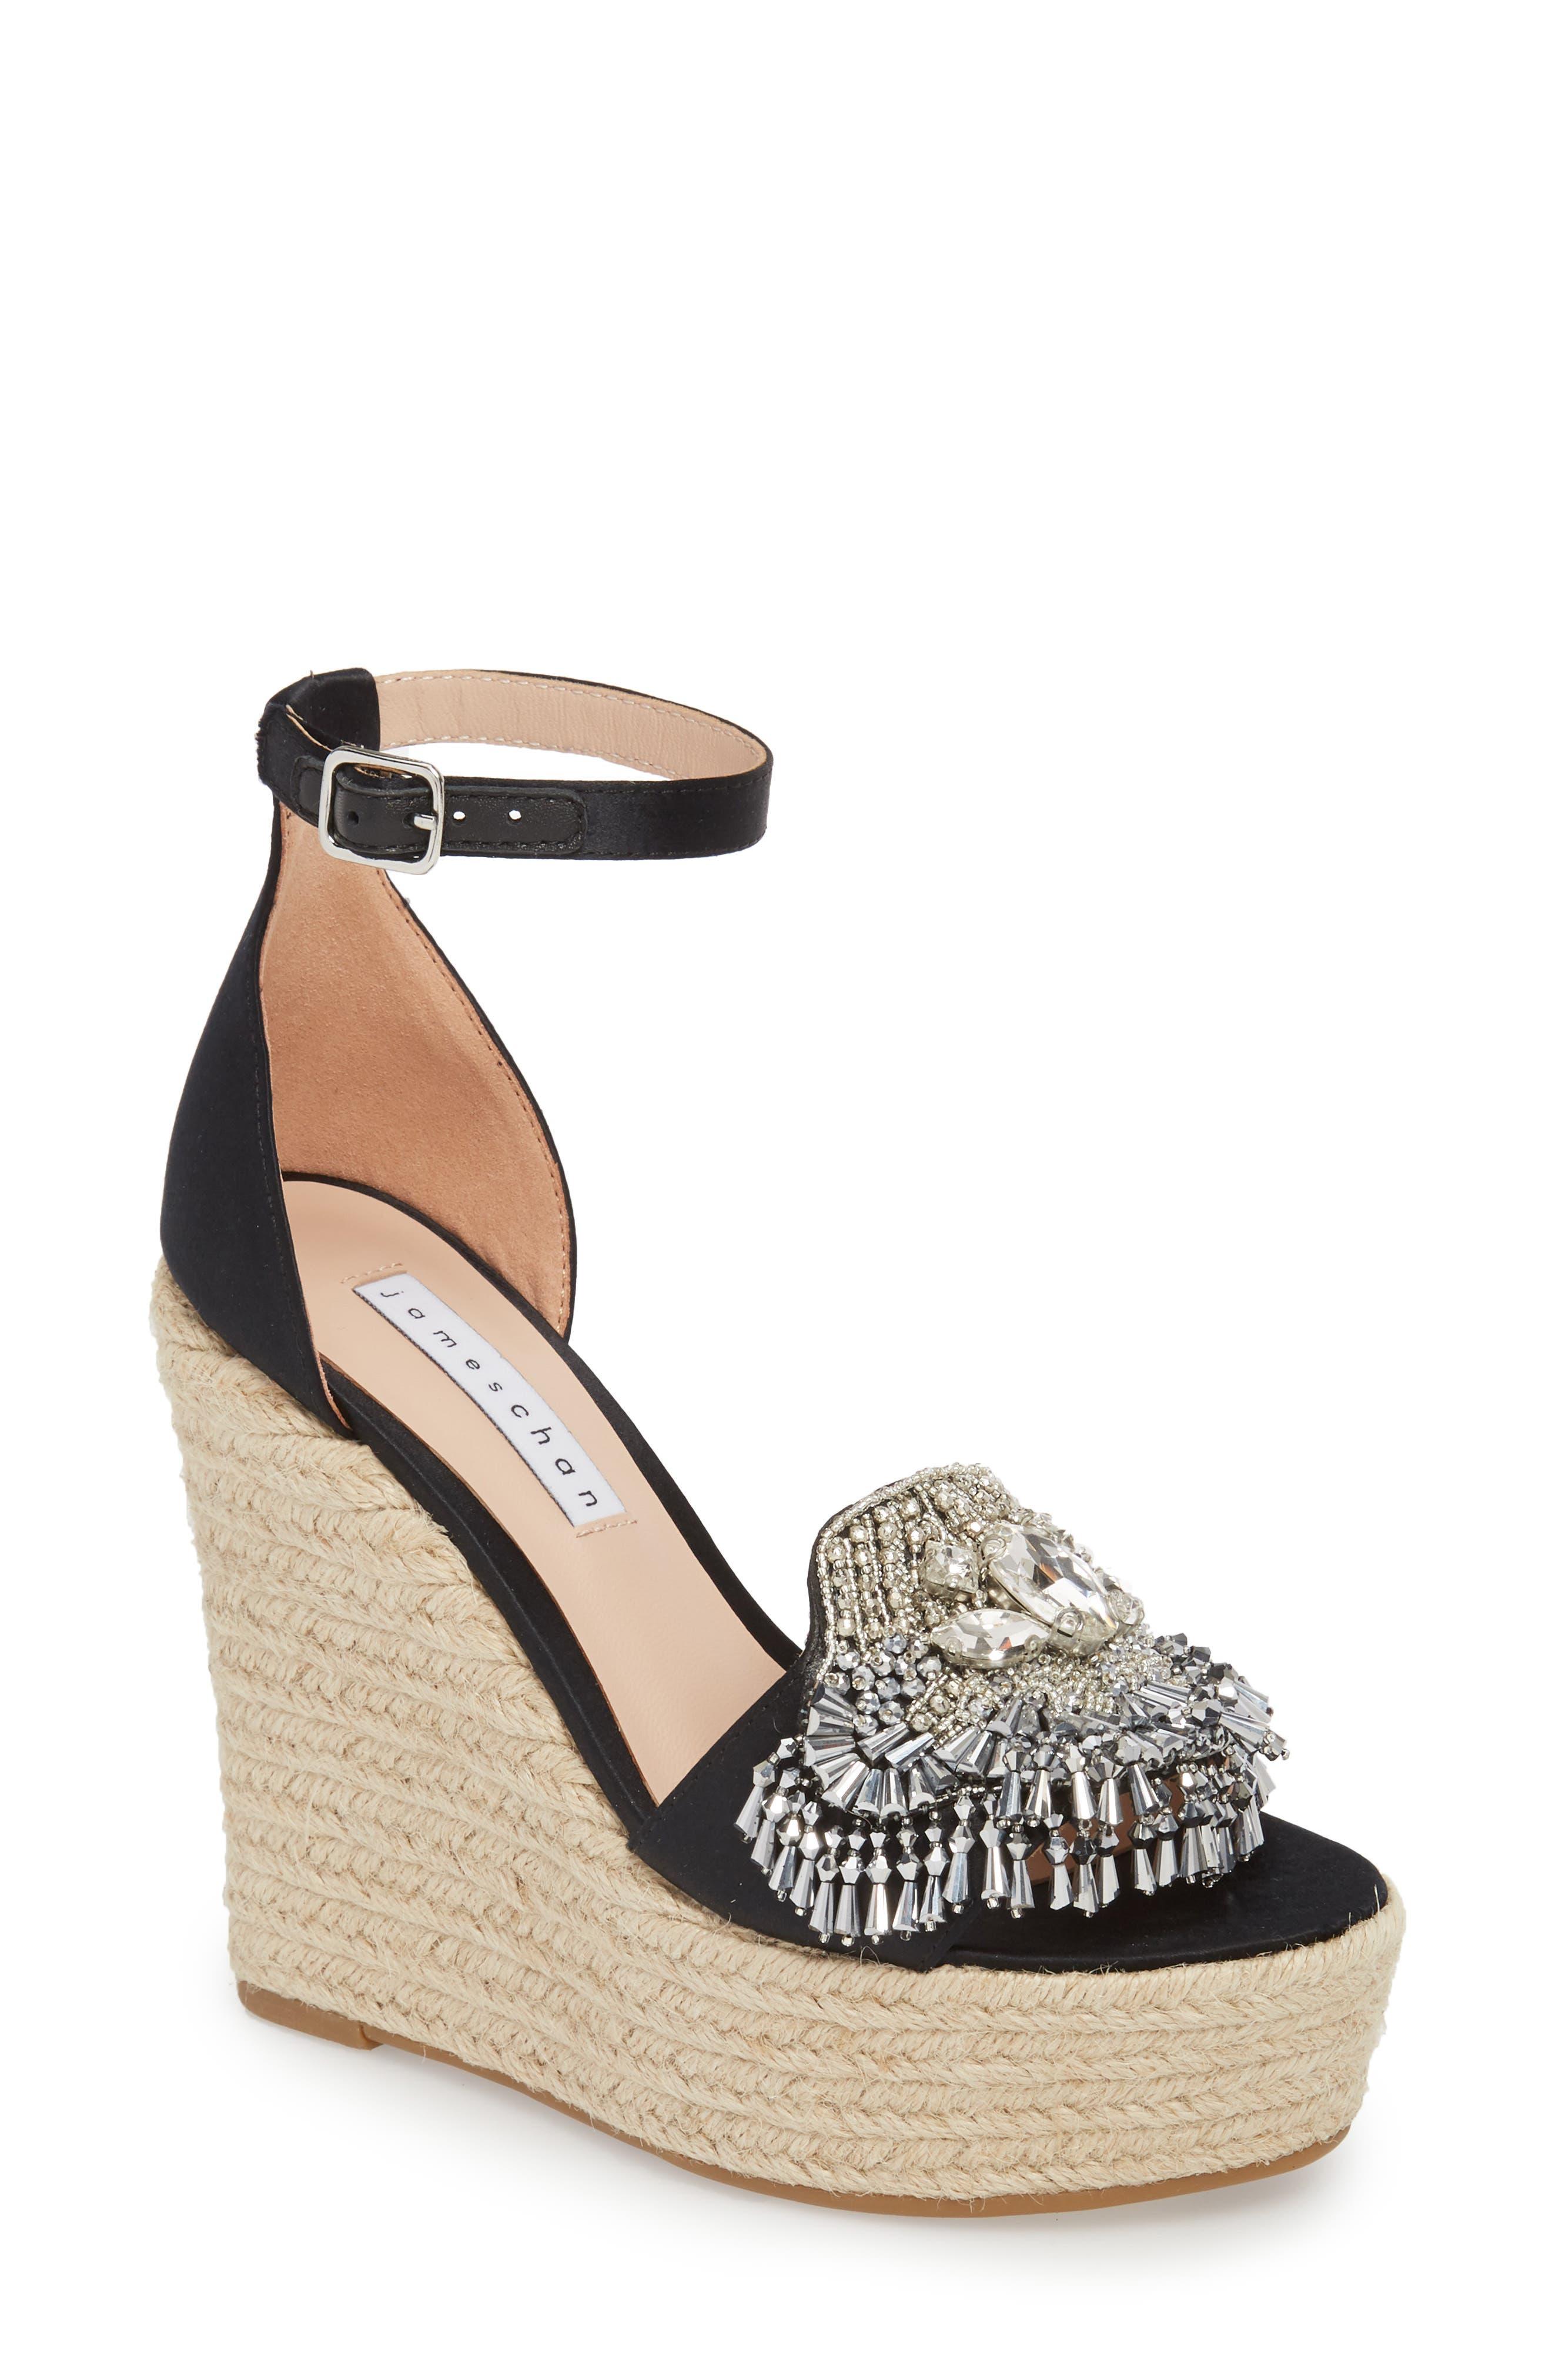 Maxim Platform Wedge Sandal,                             Main thumbnail 1, color,